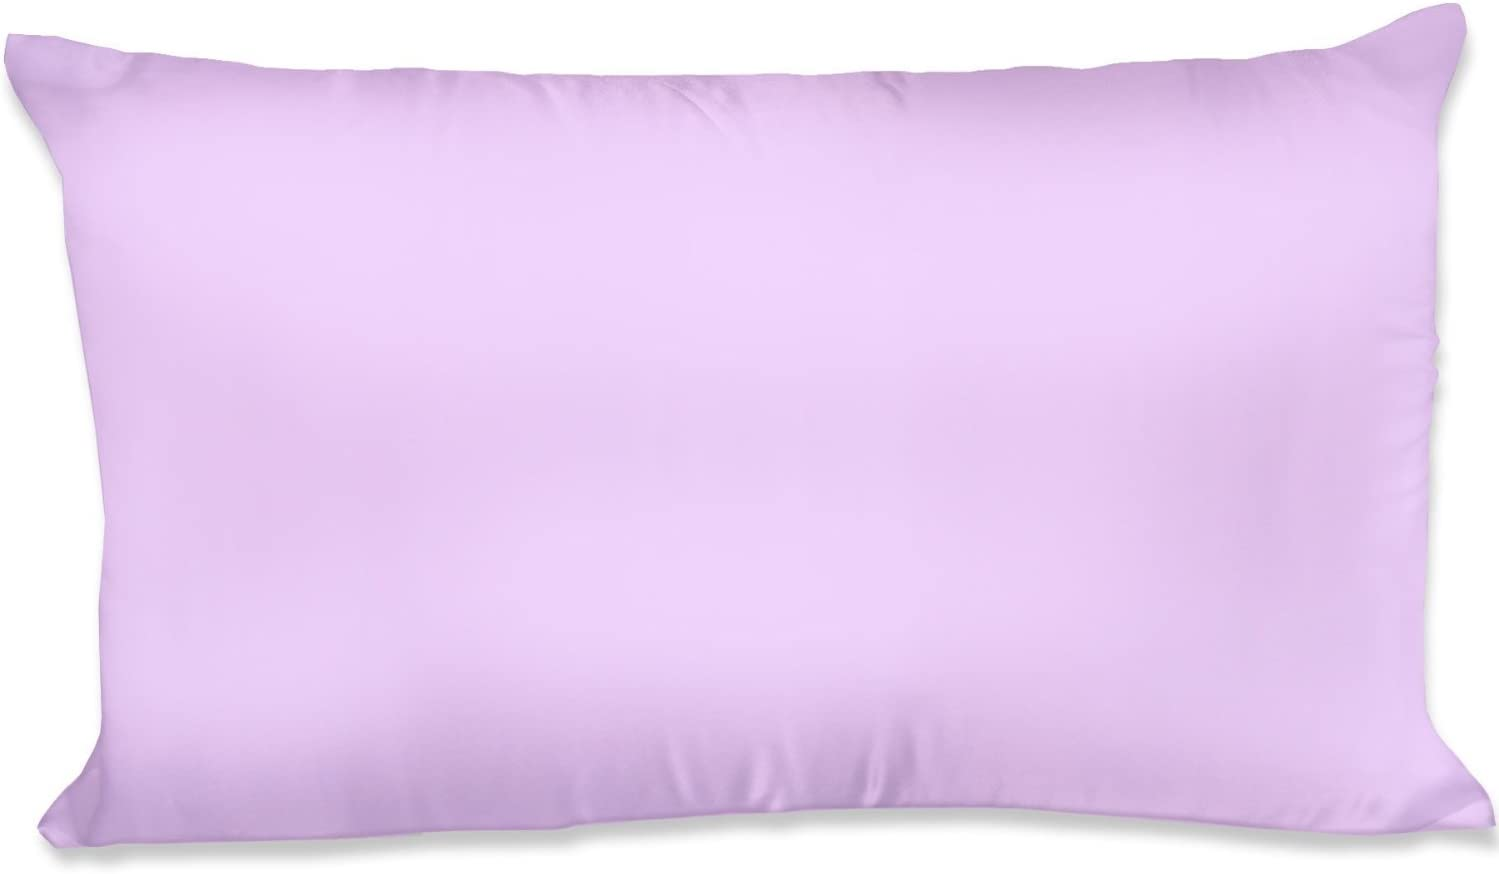 King 20x40 Lavender Spasilk Hair Beauty Satin Pillowcase